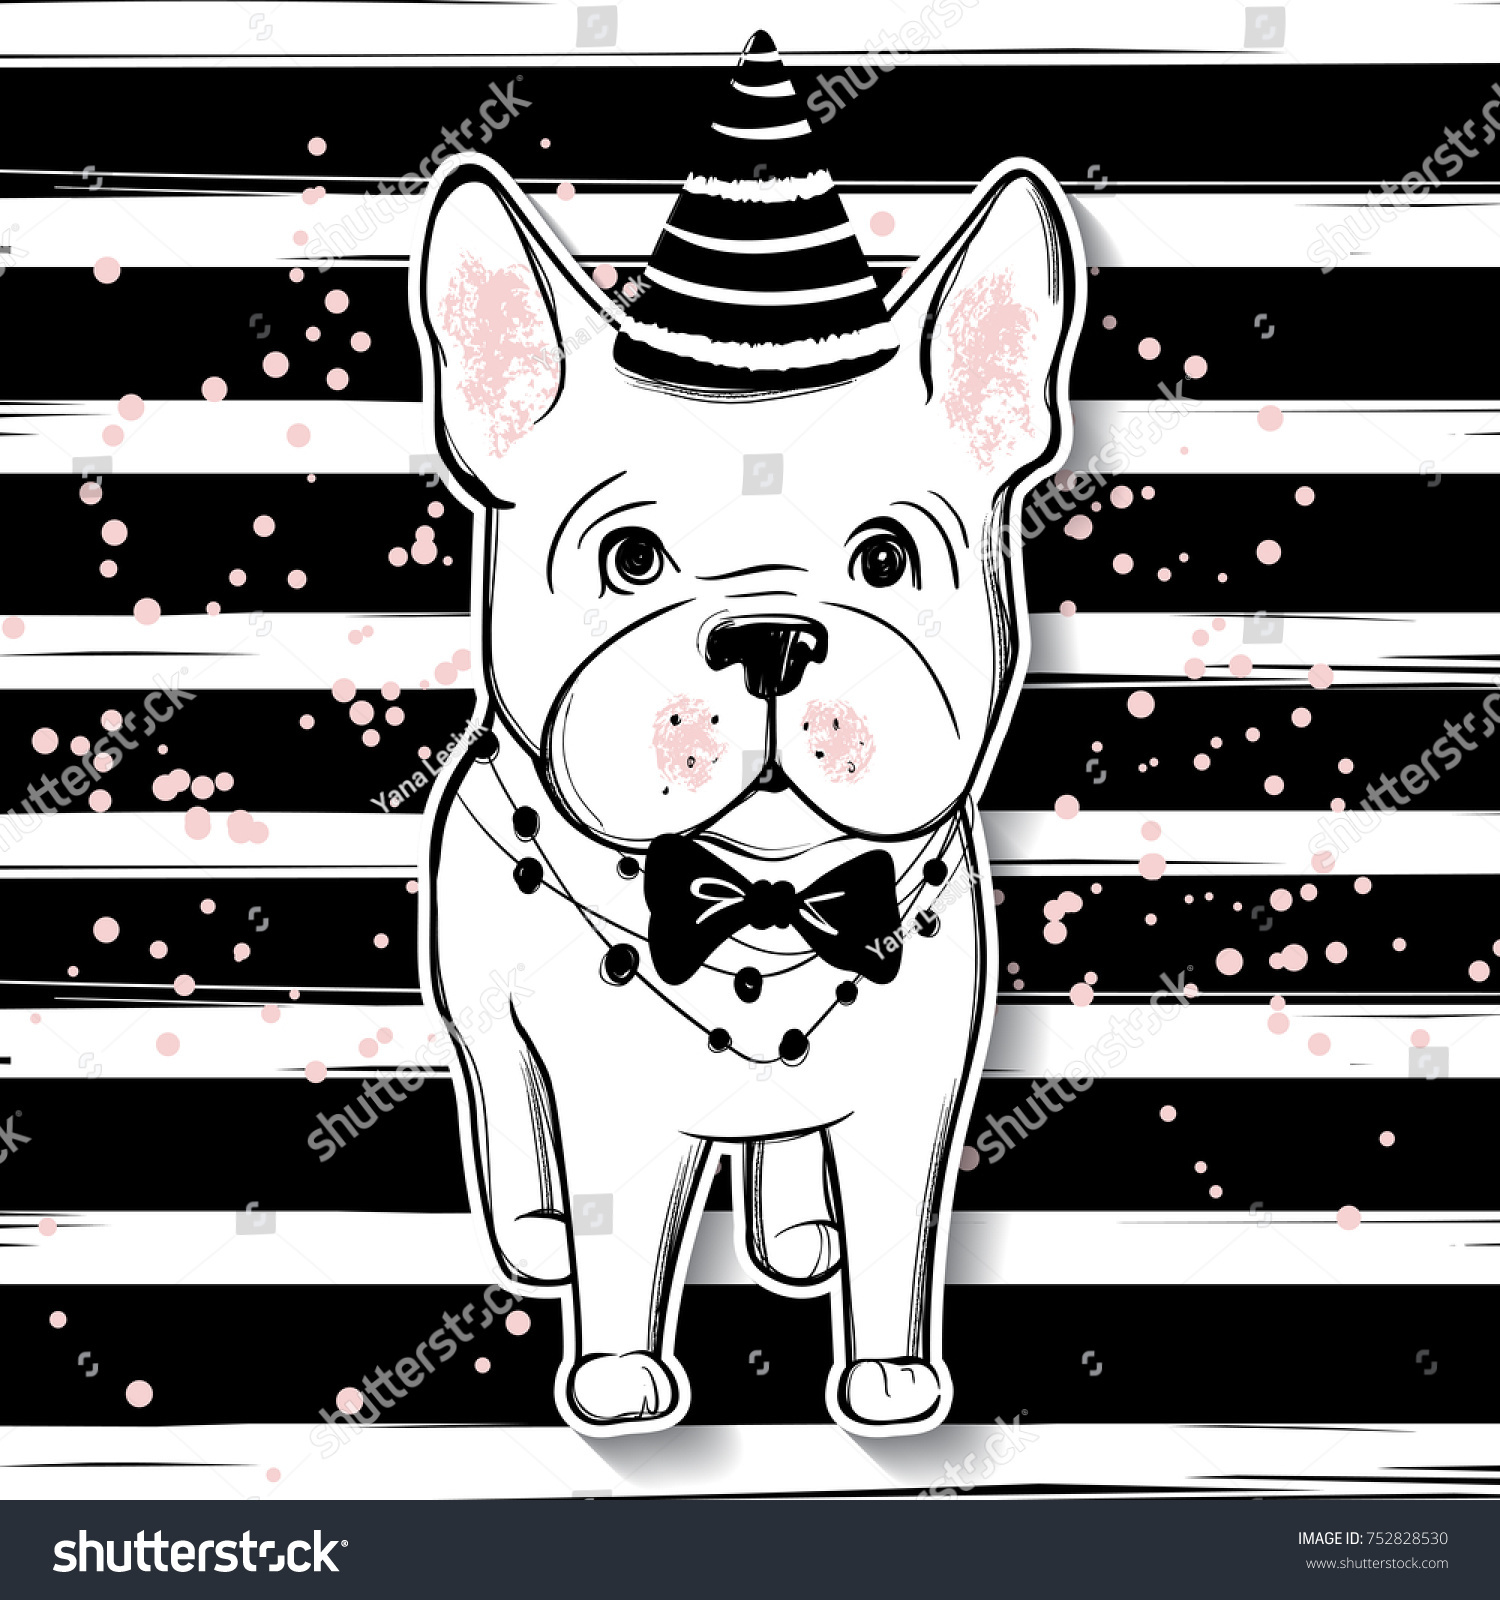 Merry Christmas Illustration Funny Dog Hand Stock Vector (Royalty ...